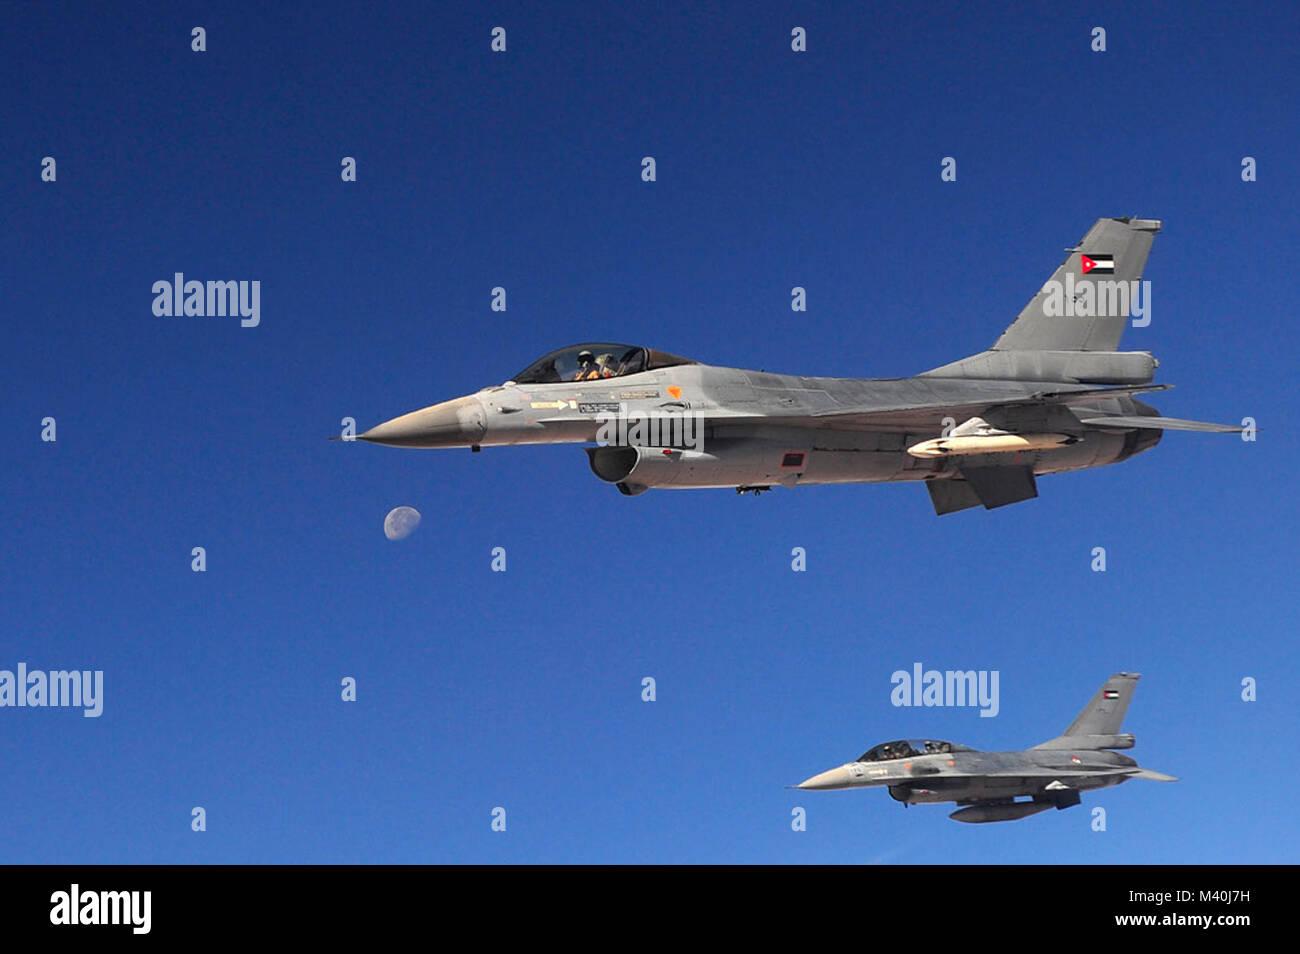 best sneakers 93b6a b0e29 Royal Jordanian Air Force F-16 Fighting Falcons fly over Jordan during a  refueling mission. (U.S. Air Force Photo Senior Airman Asha Kin)  111017-F-BB898-523 ...